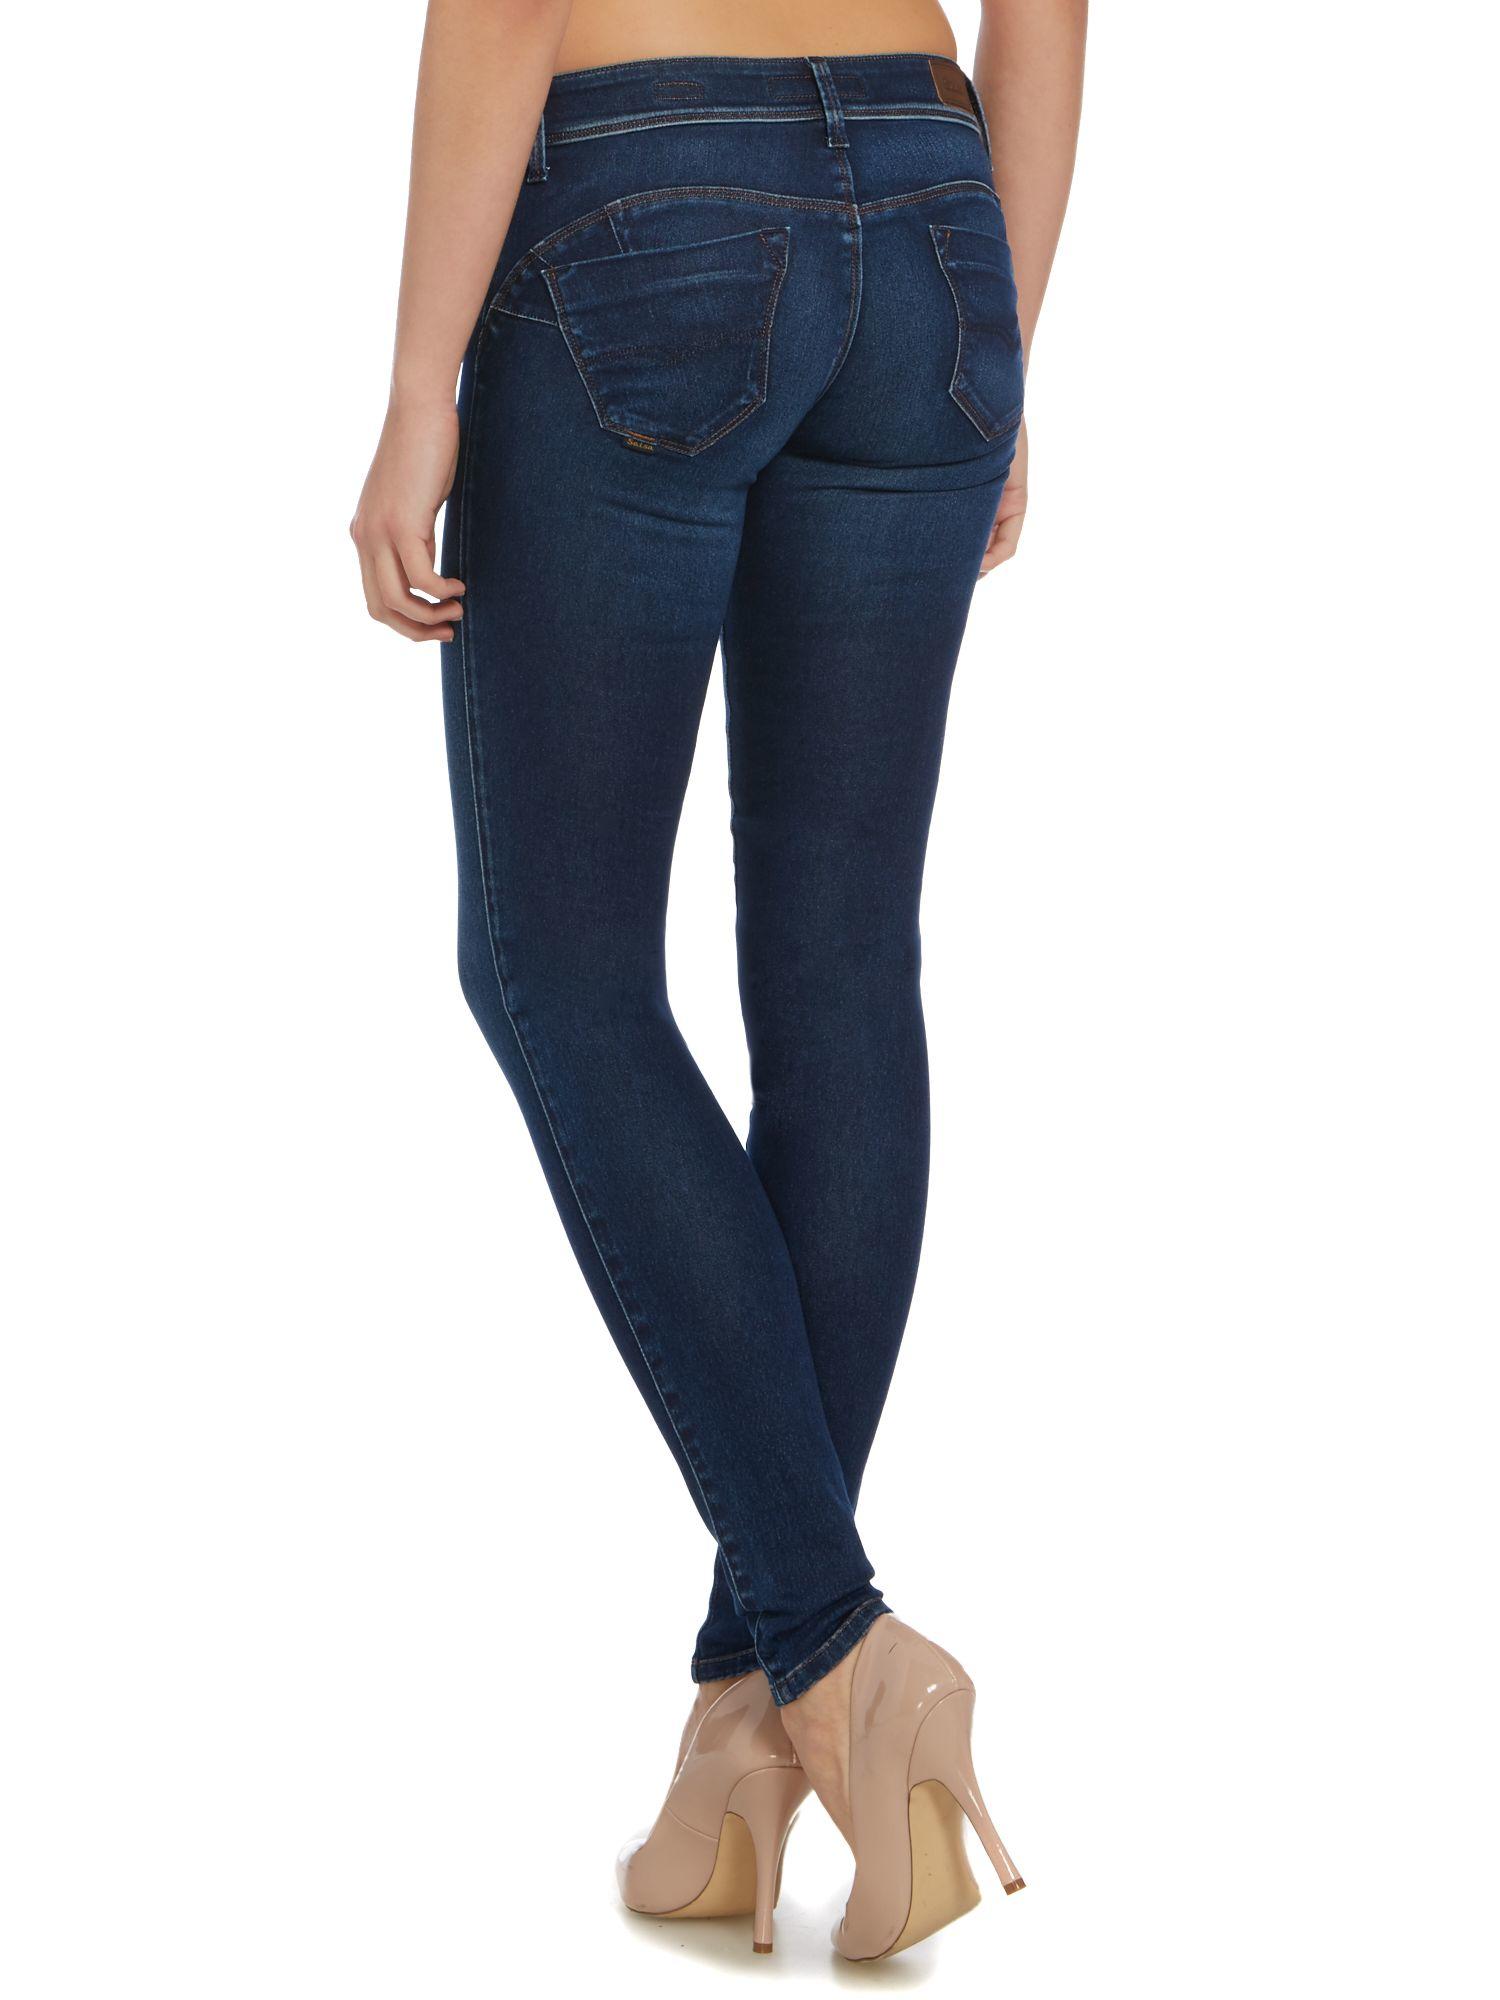 salsa wonder push up cellulite jean in denim dark wash in blue lyst. Black Bedroom Furniture Sets. Home Design Ideas